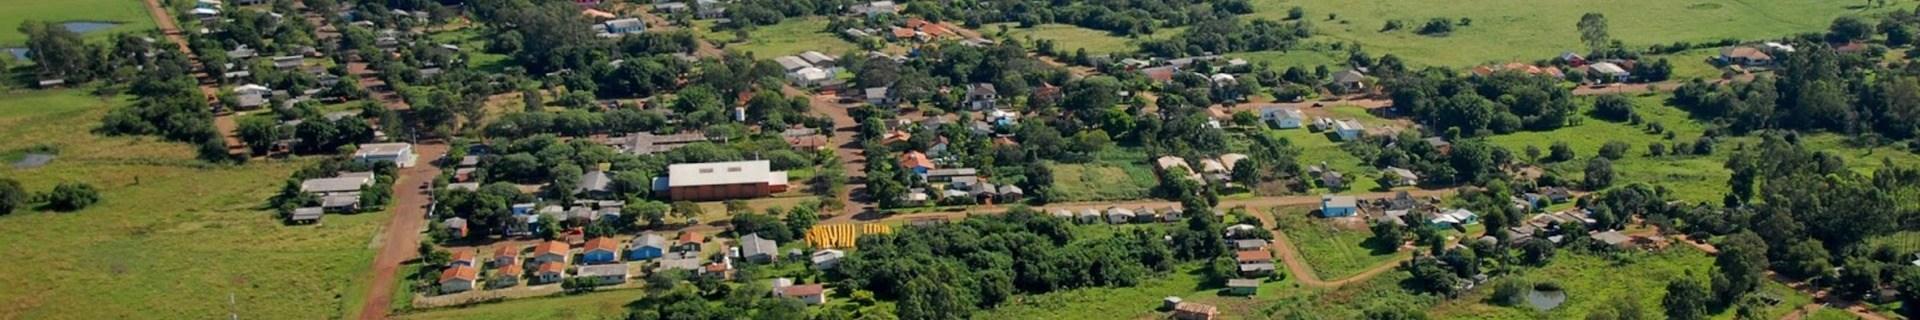 Garruchos Rio Grande do Sul fonte: www.rotamissoes.com.br